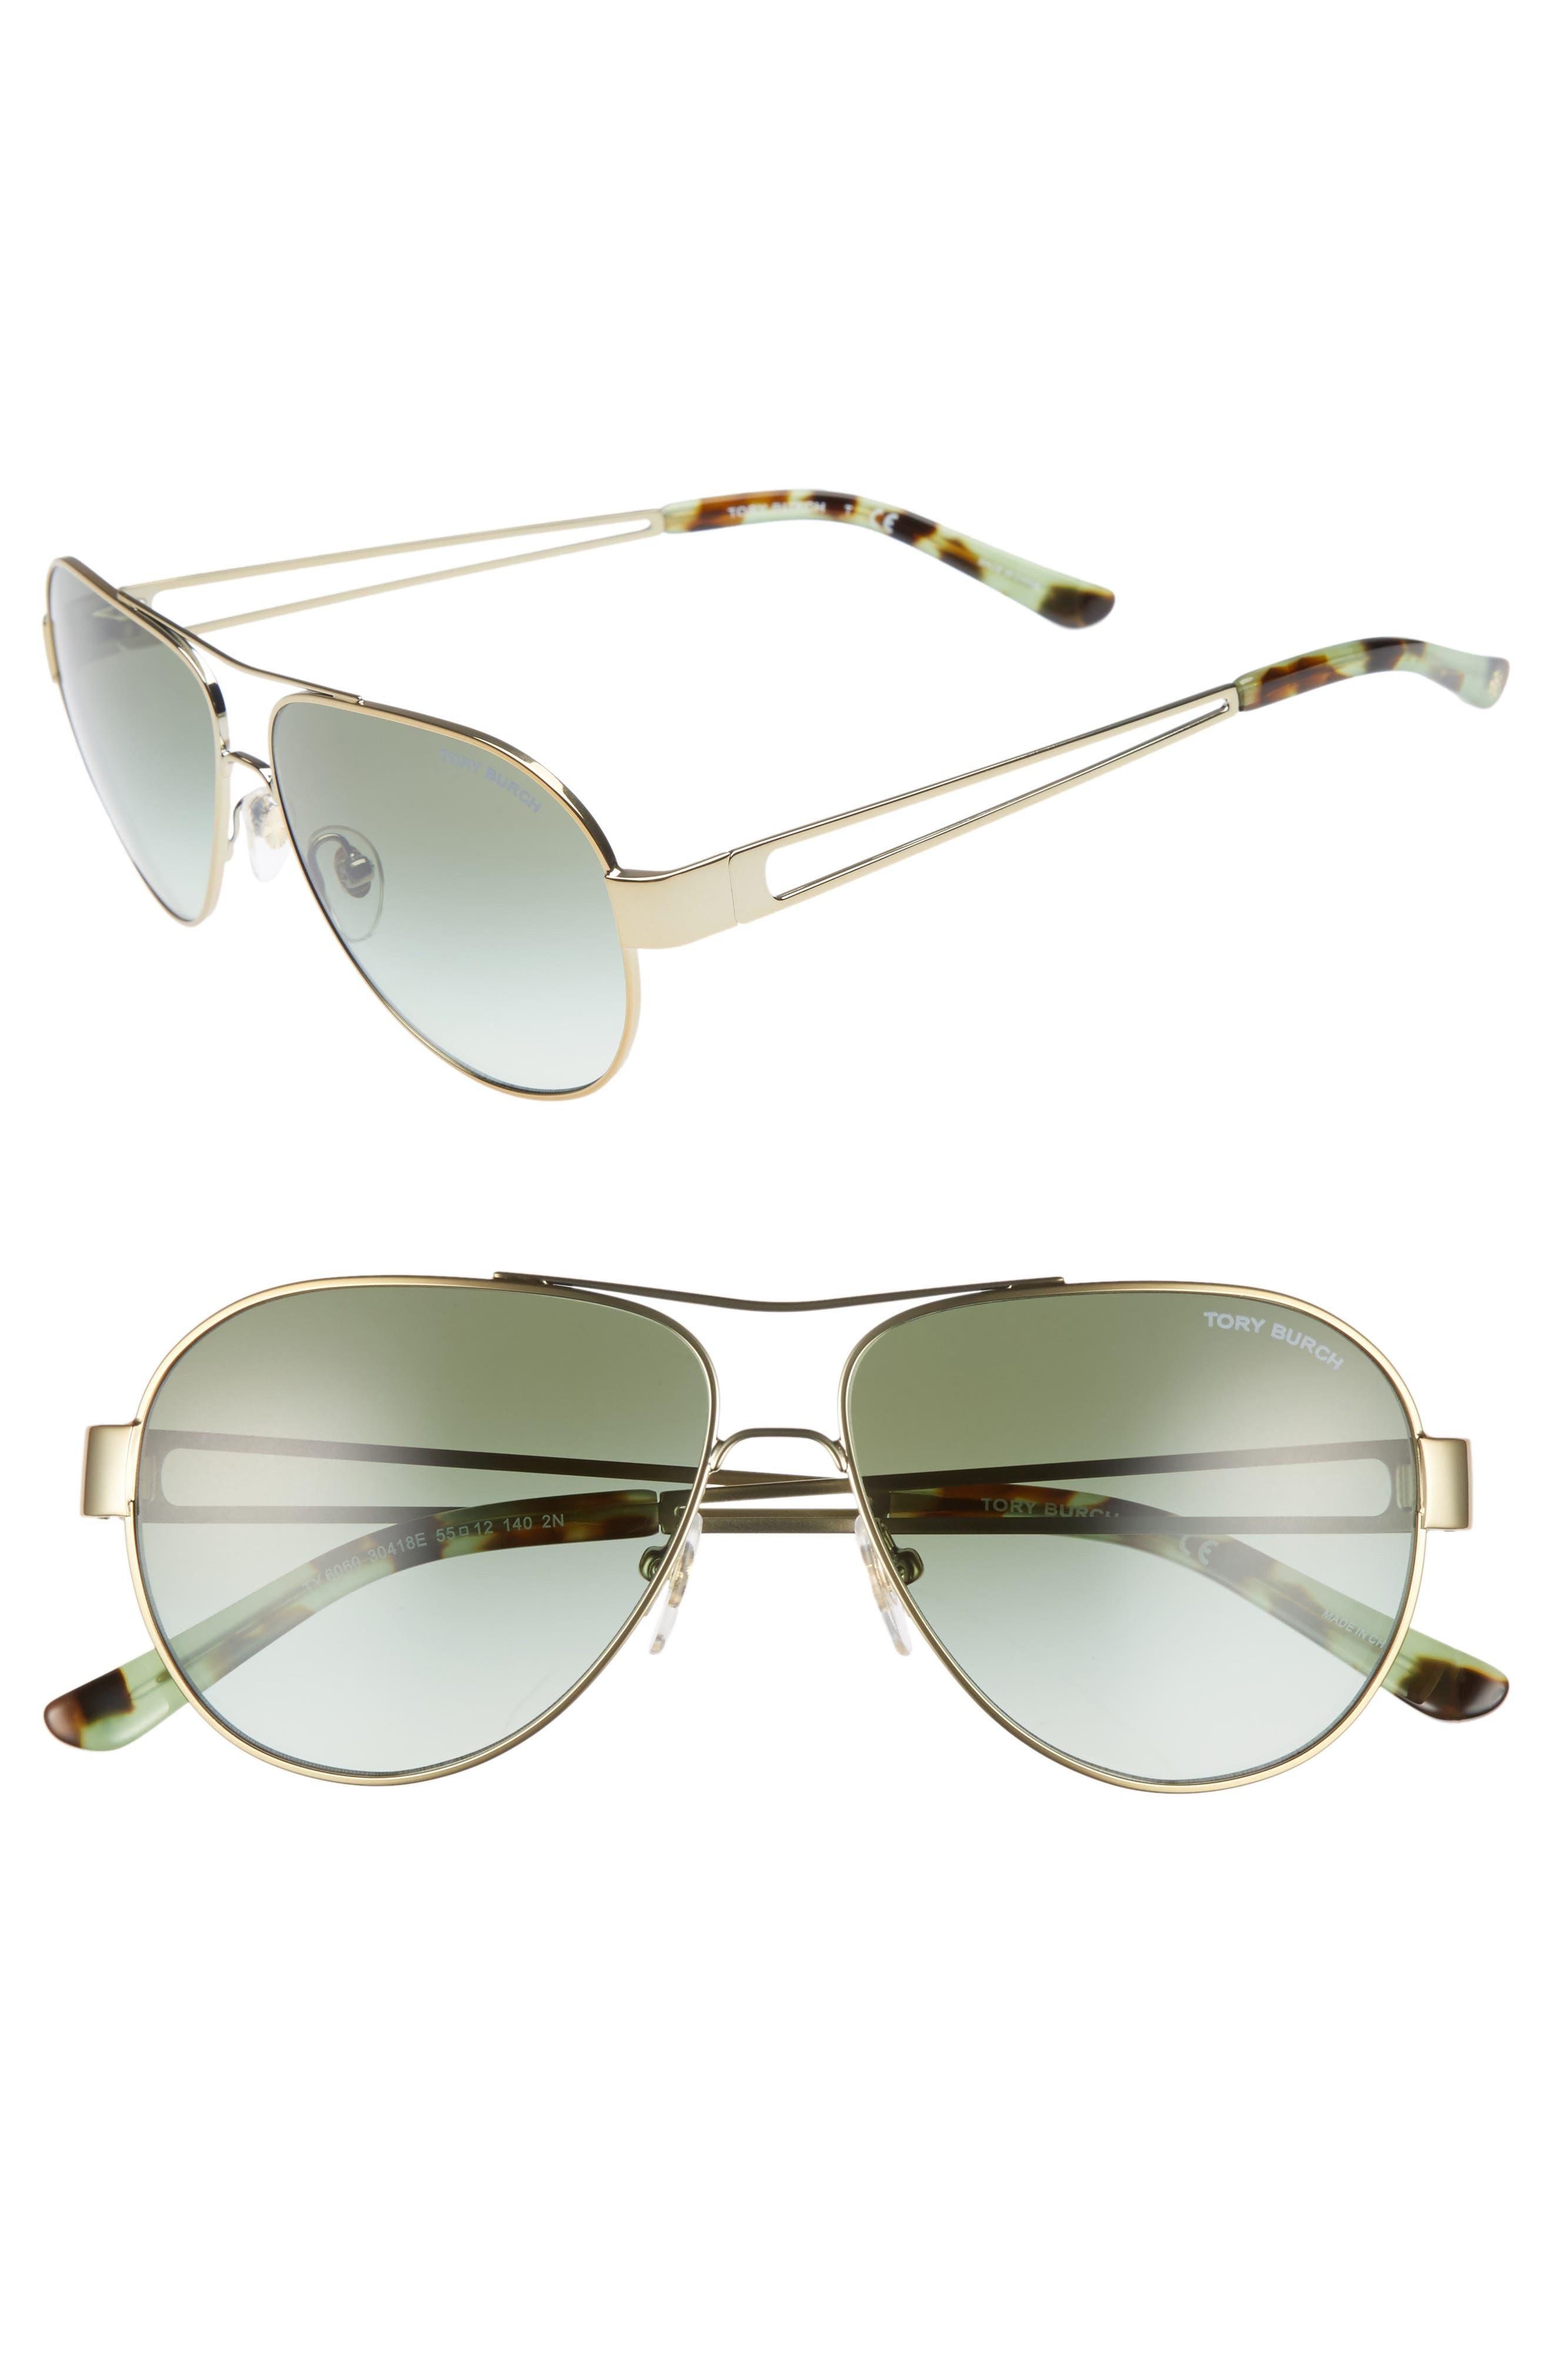 Alternate Image 1 Selected - Tory Burch 55mm Polarized Aviator Sunglasses